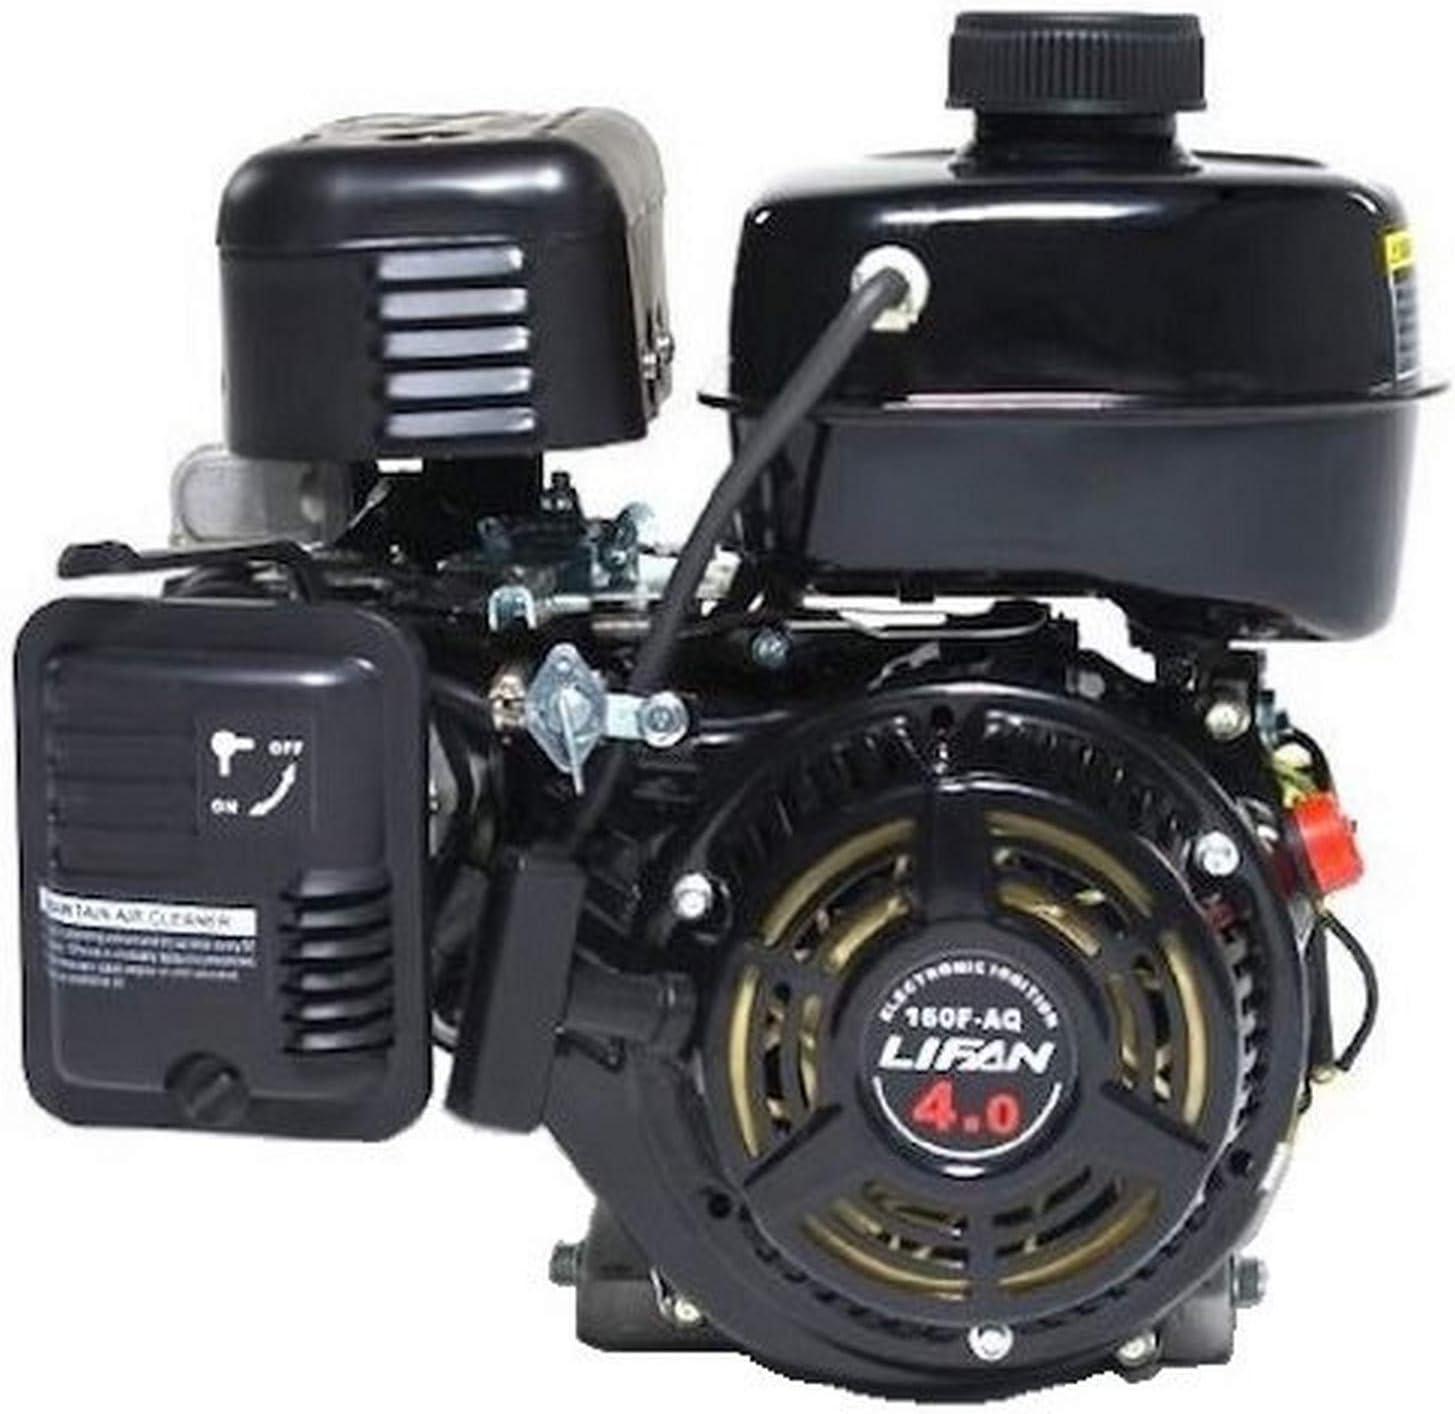 Lifan LF160F-AQ 4 HP 118cc 4-Stroke OHV Industrial Grade Gas Engine with 3/4